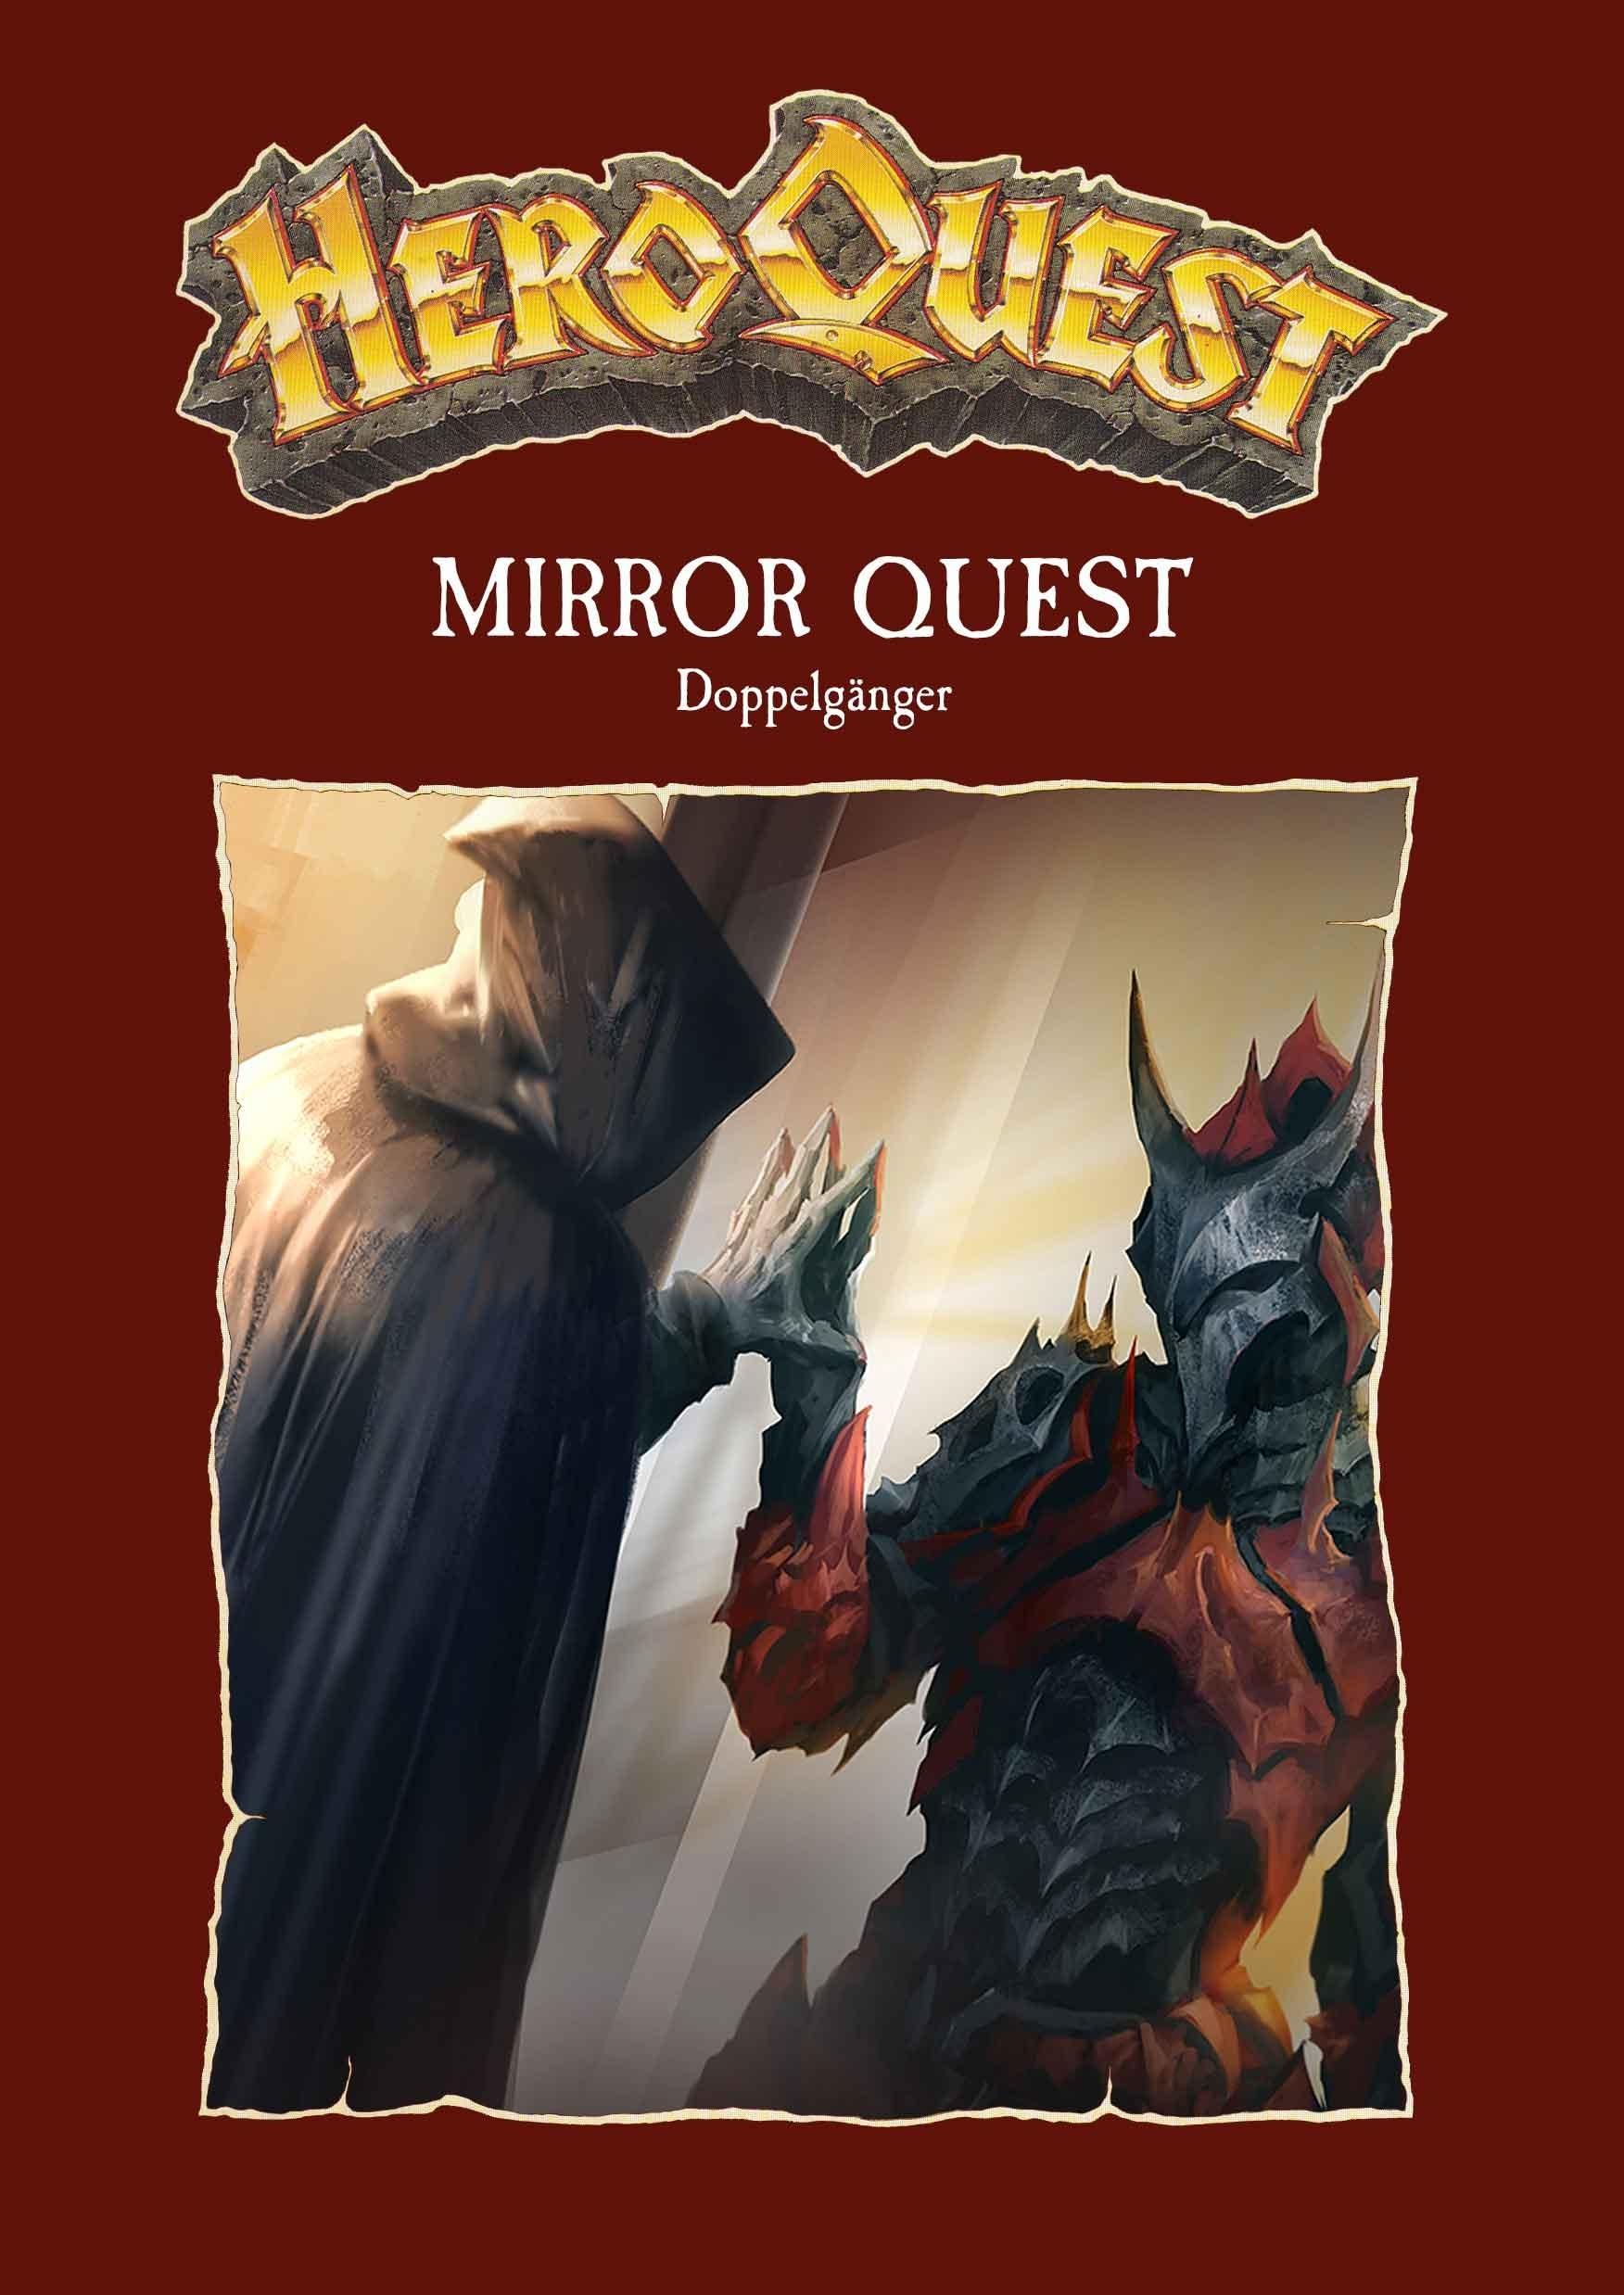 Mirror Quest - Doppelgänger